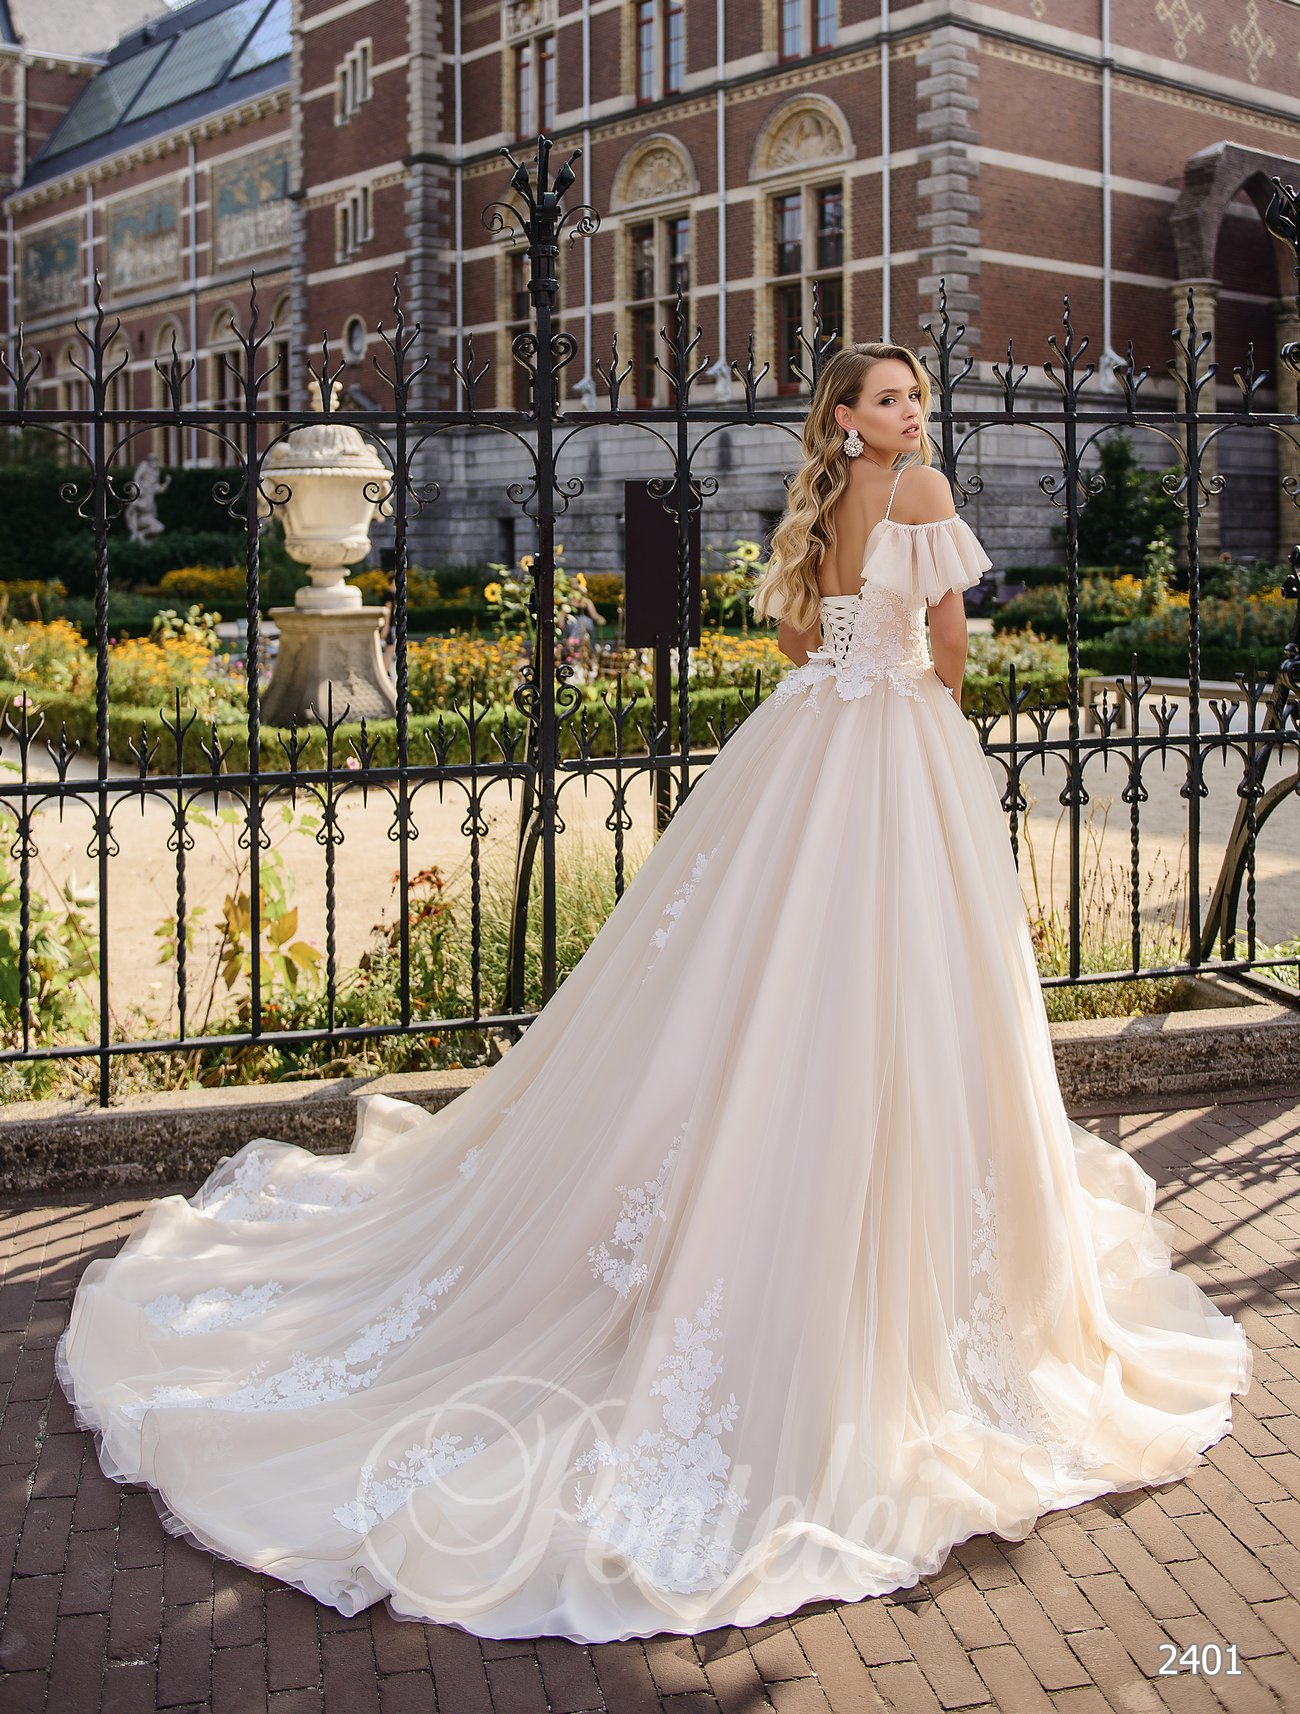 Wedding dress with ruffles  | Buy wedding dresses wholesale from Pentelei